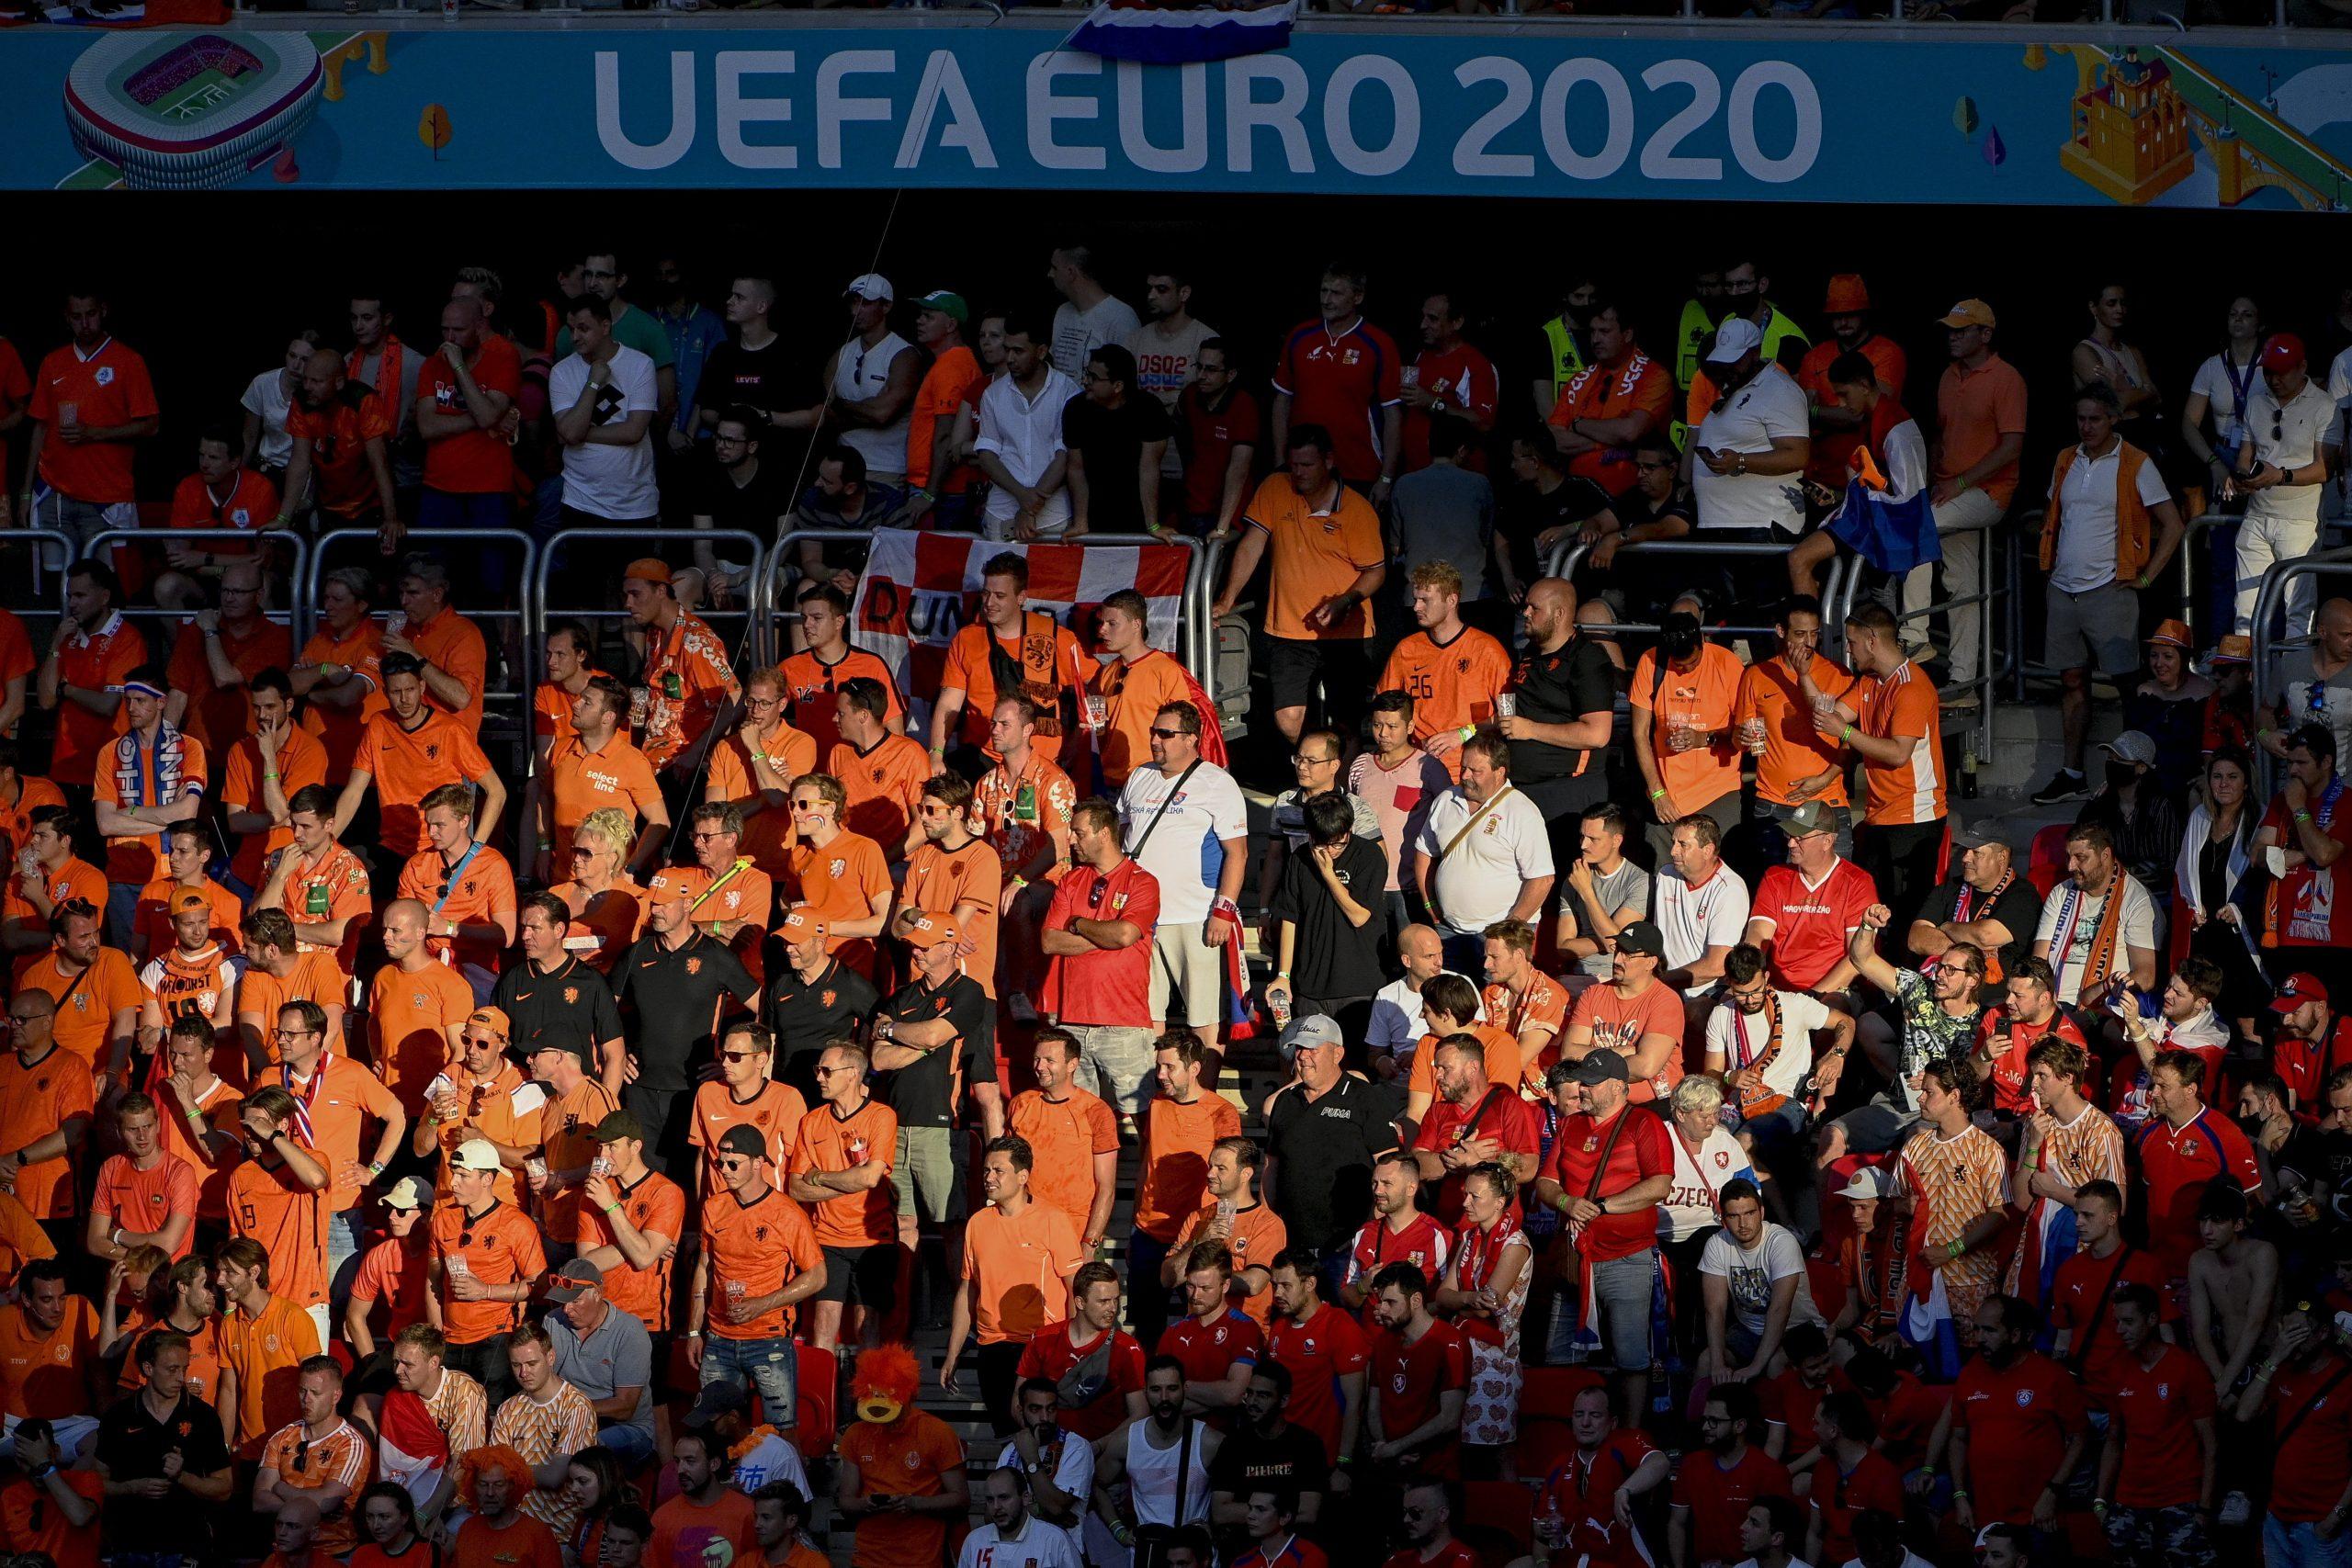 Fidesz Politicians Happy Czech Team 'Brought the Dutch to Their Knees'